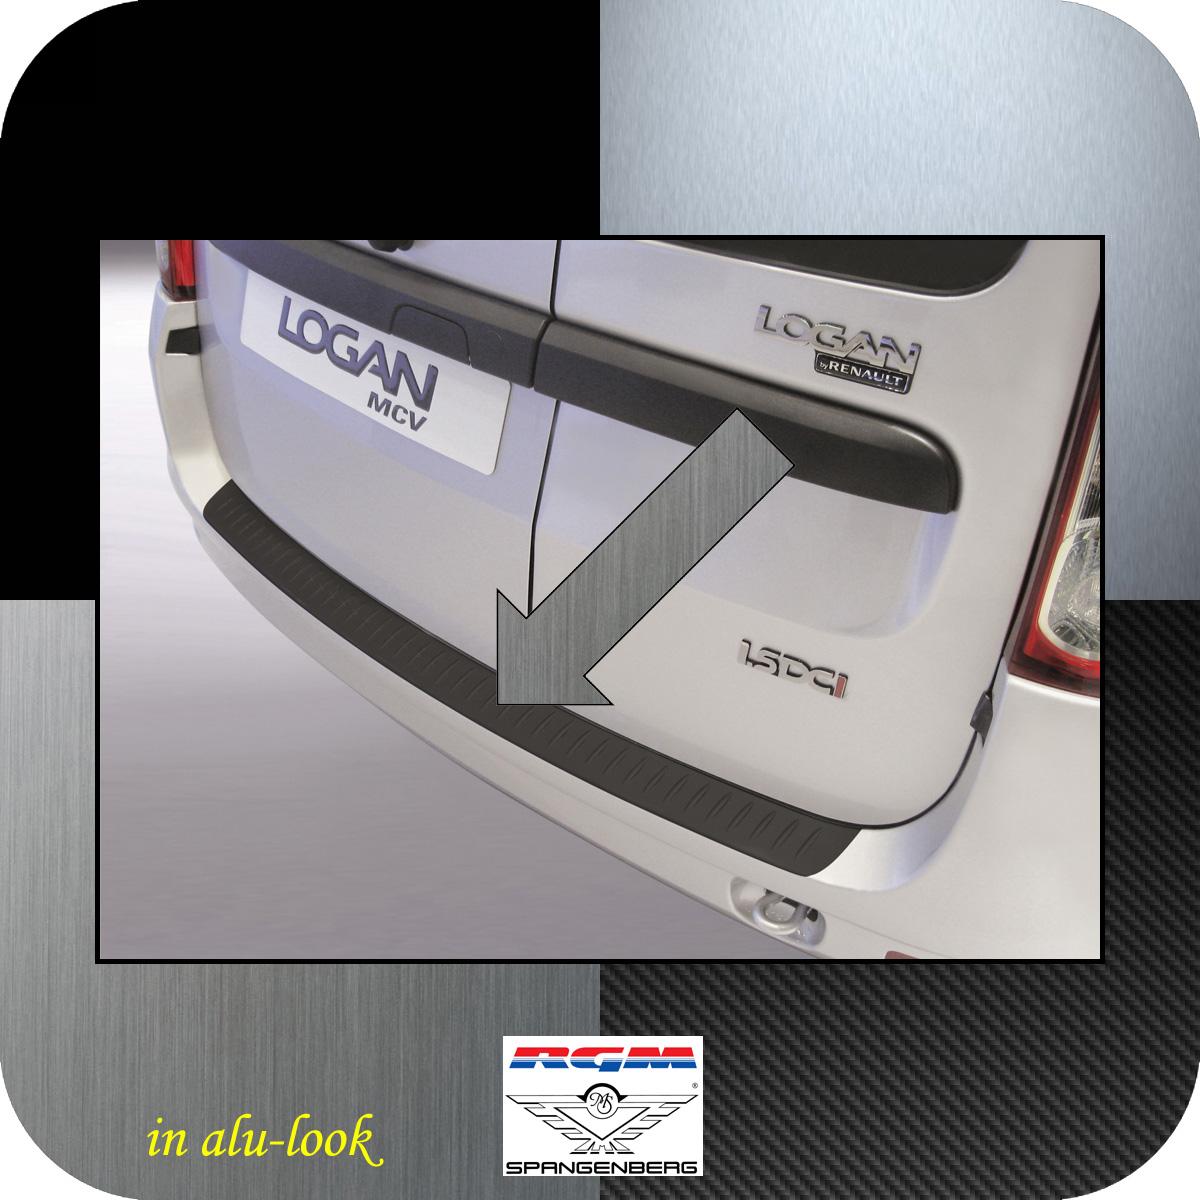 Ladekantenschutz Alu-Look Dacia Logan MCV I Kombi ab facelift 2009-13 3504314